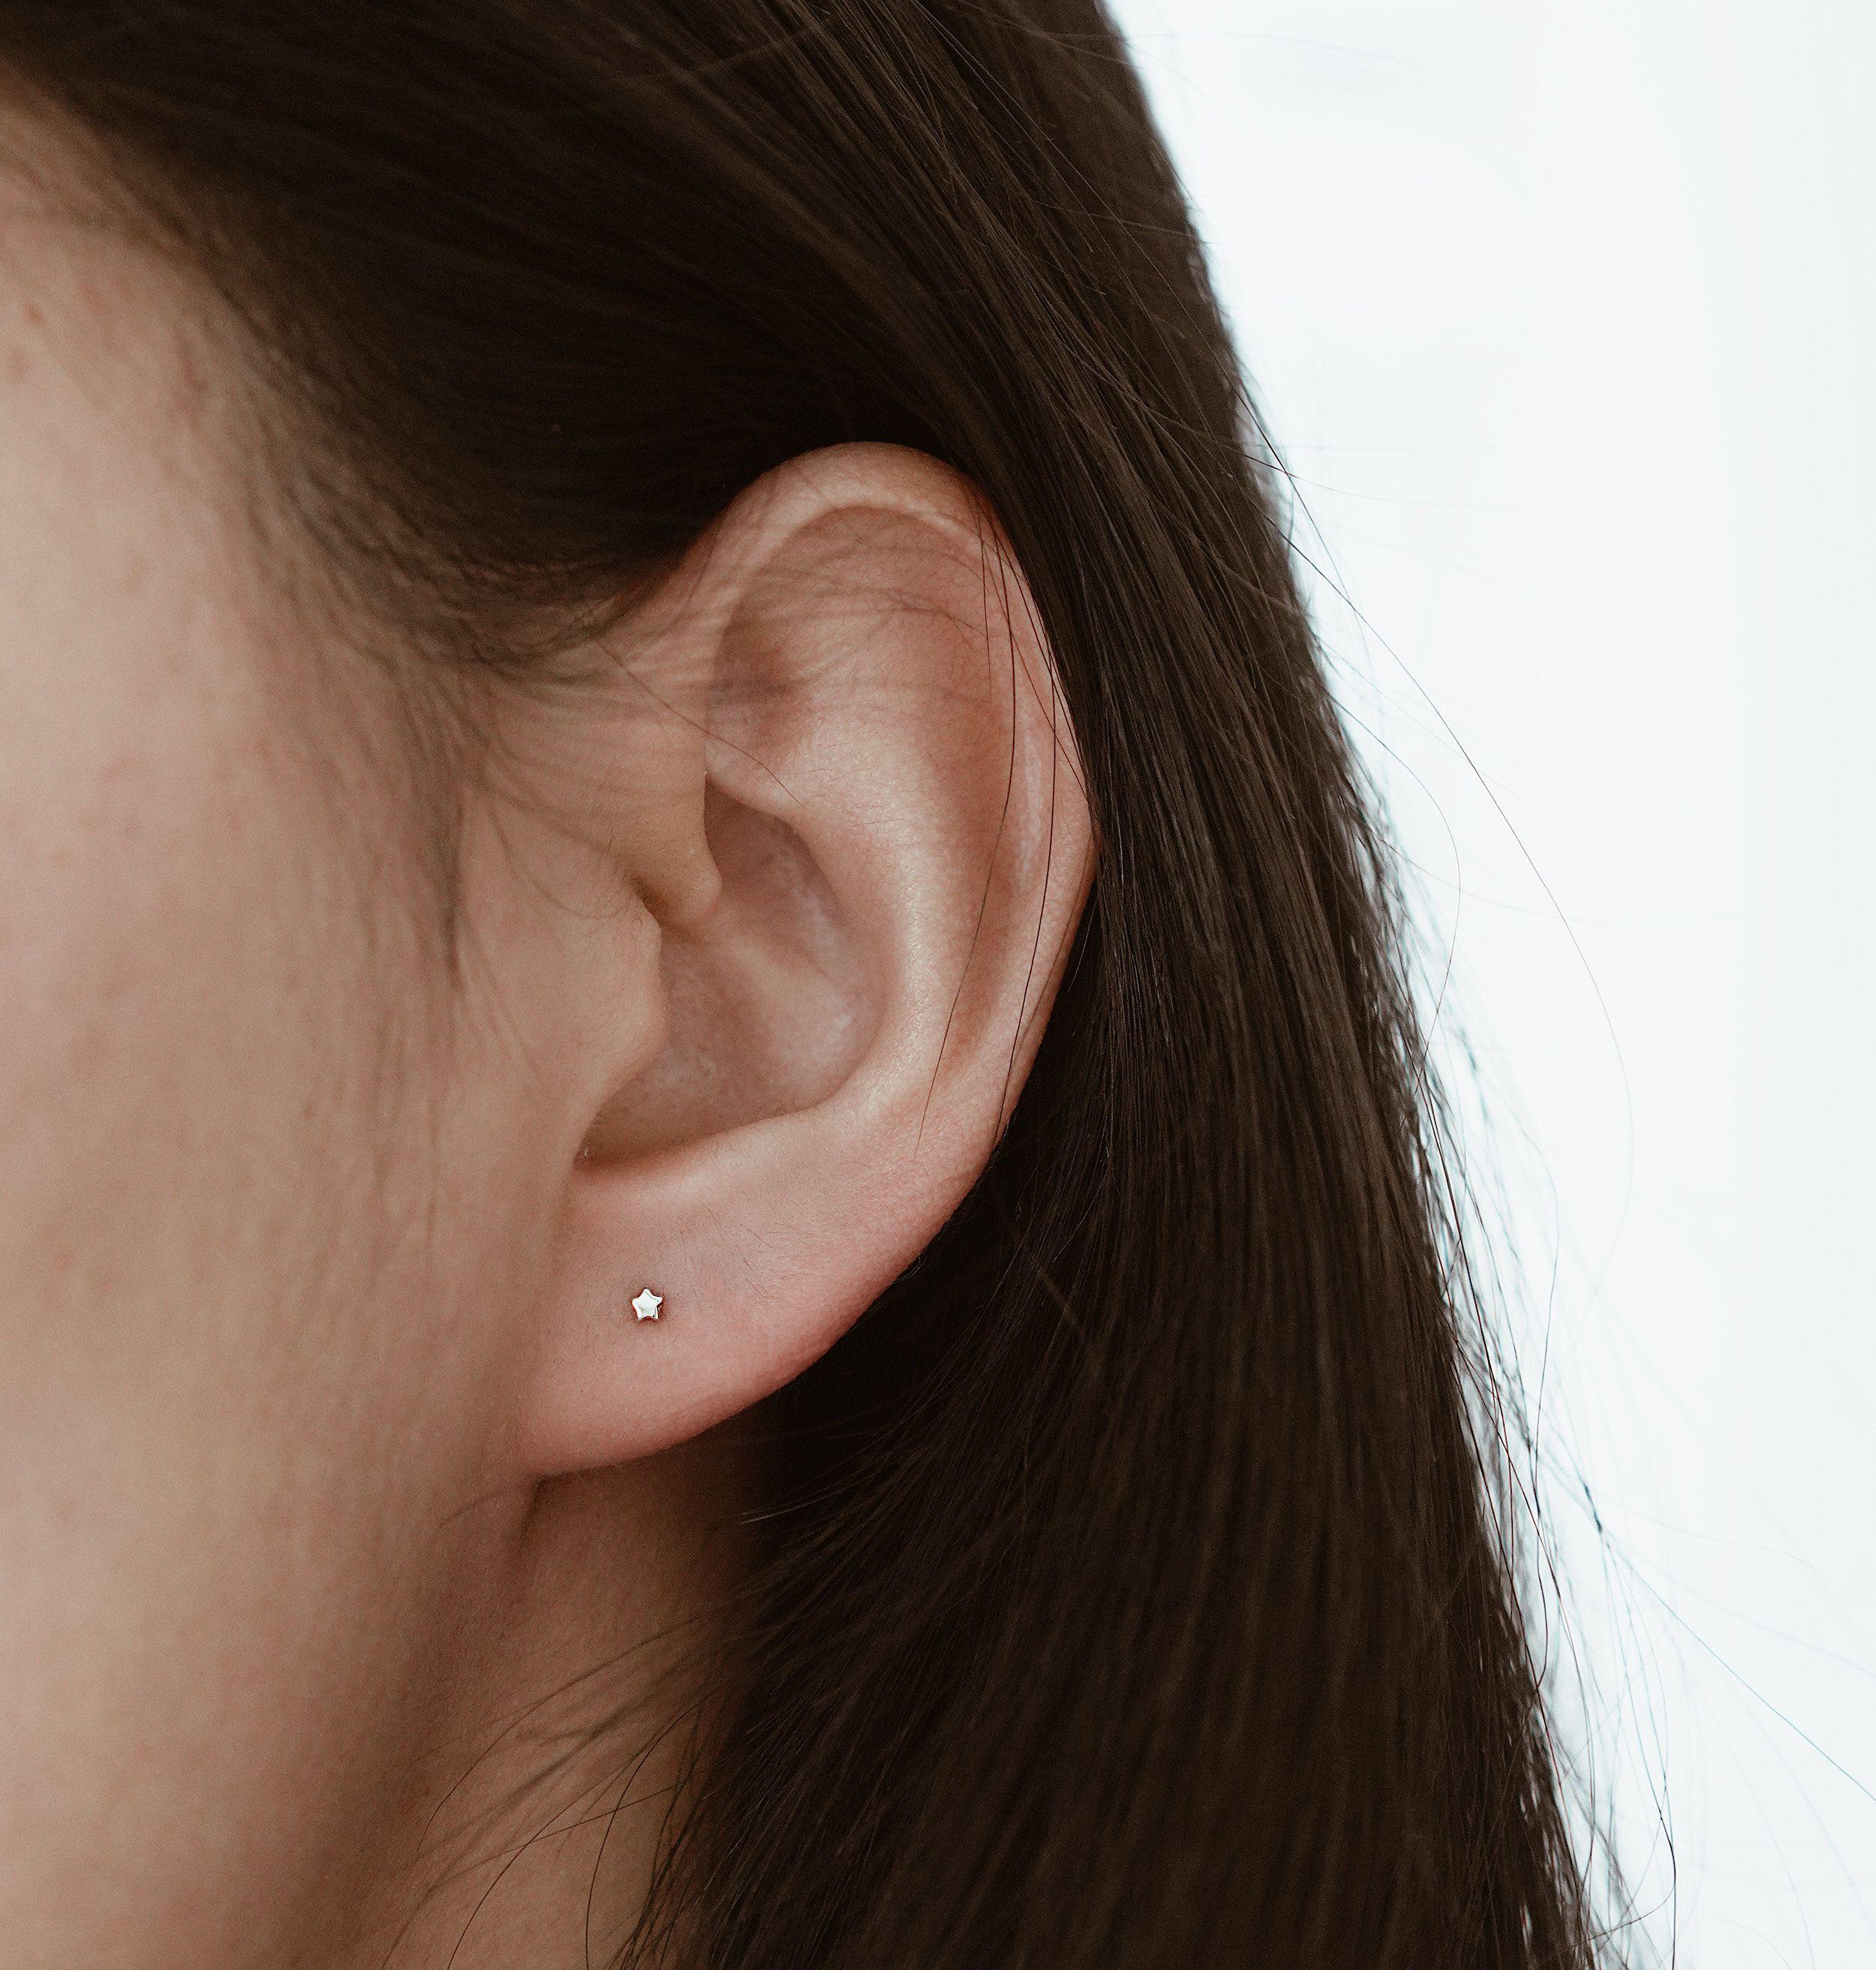 Star earrings Minimal earrings Stud earrings Hoop earrings Dainty earrings Delicate earrings